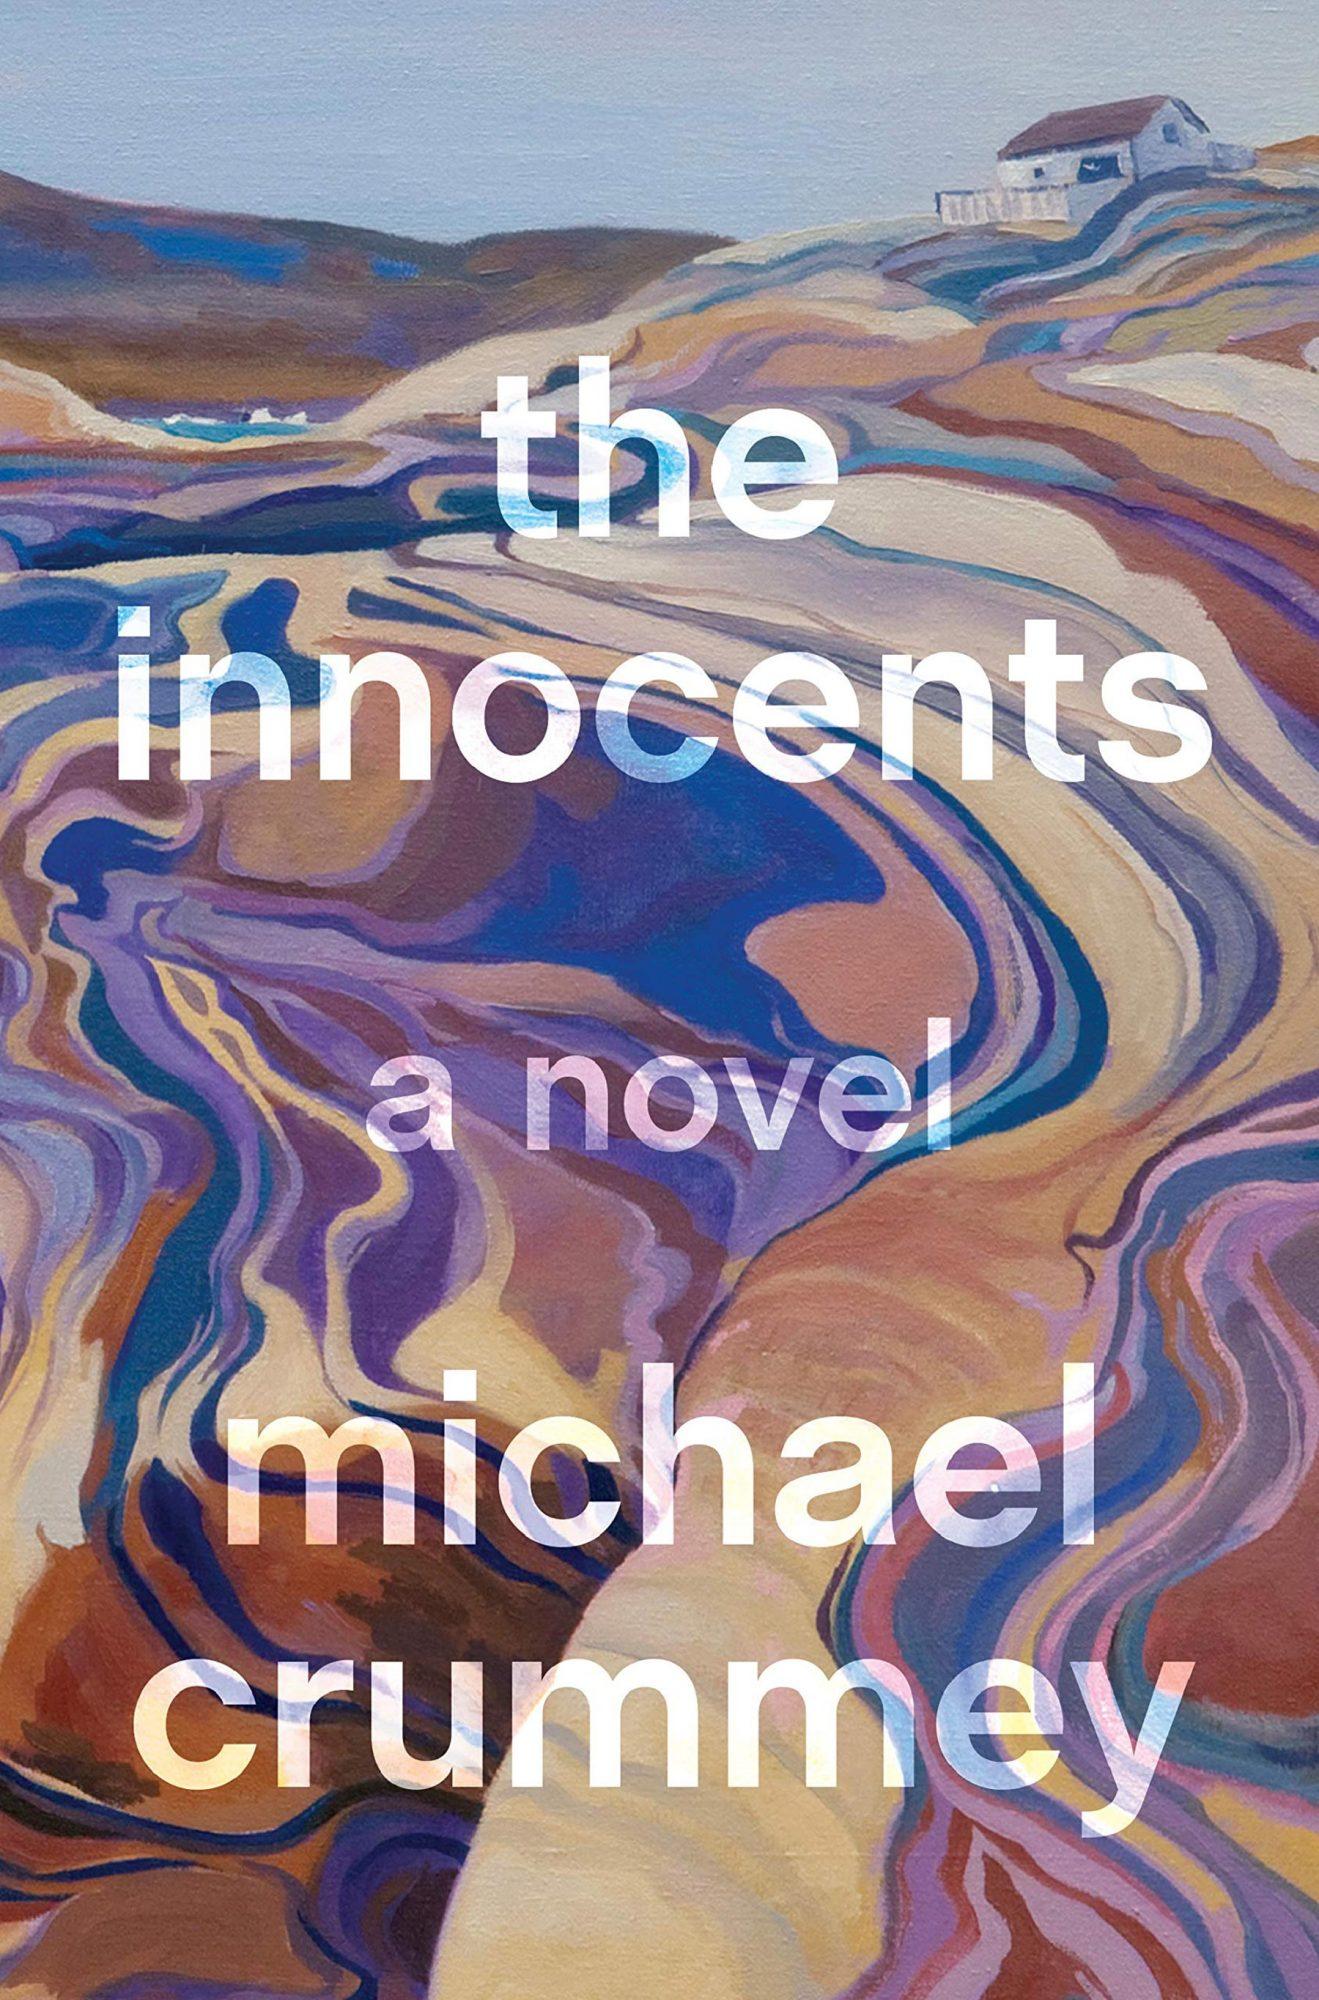 Michael Crummey, The InnocentsPublisher: Doubleday